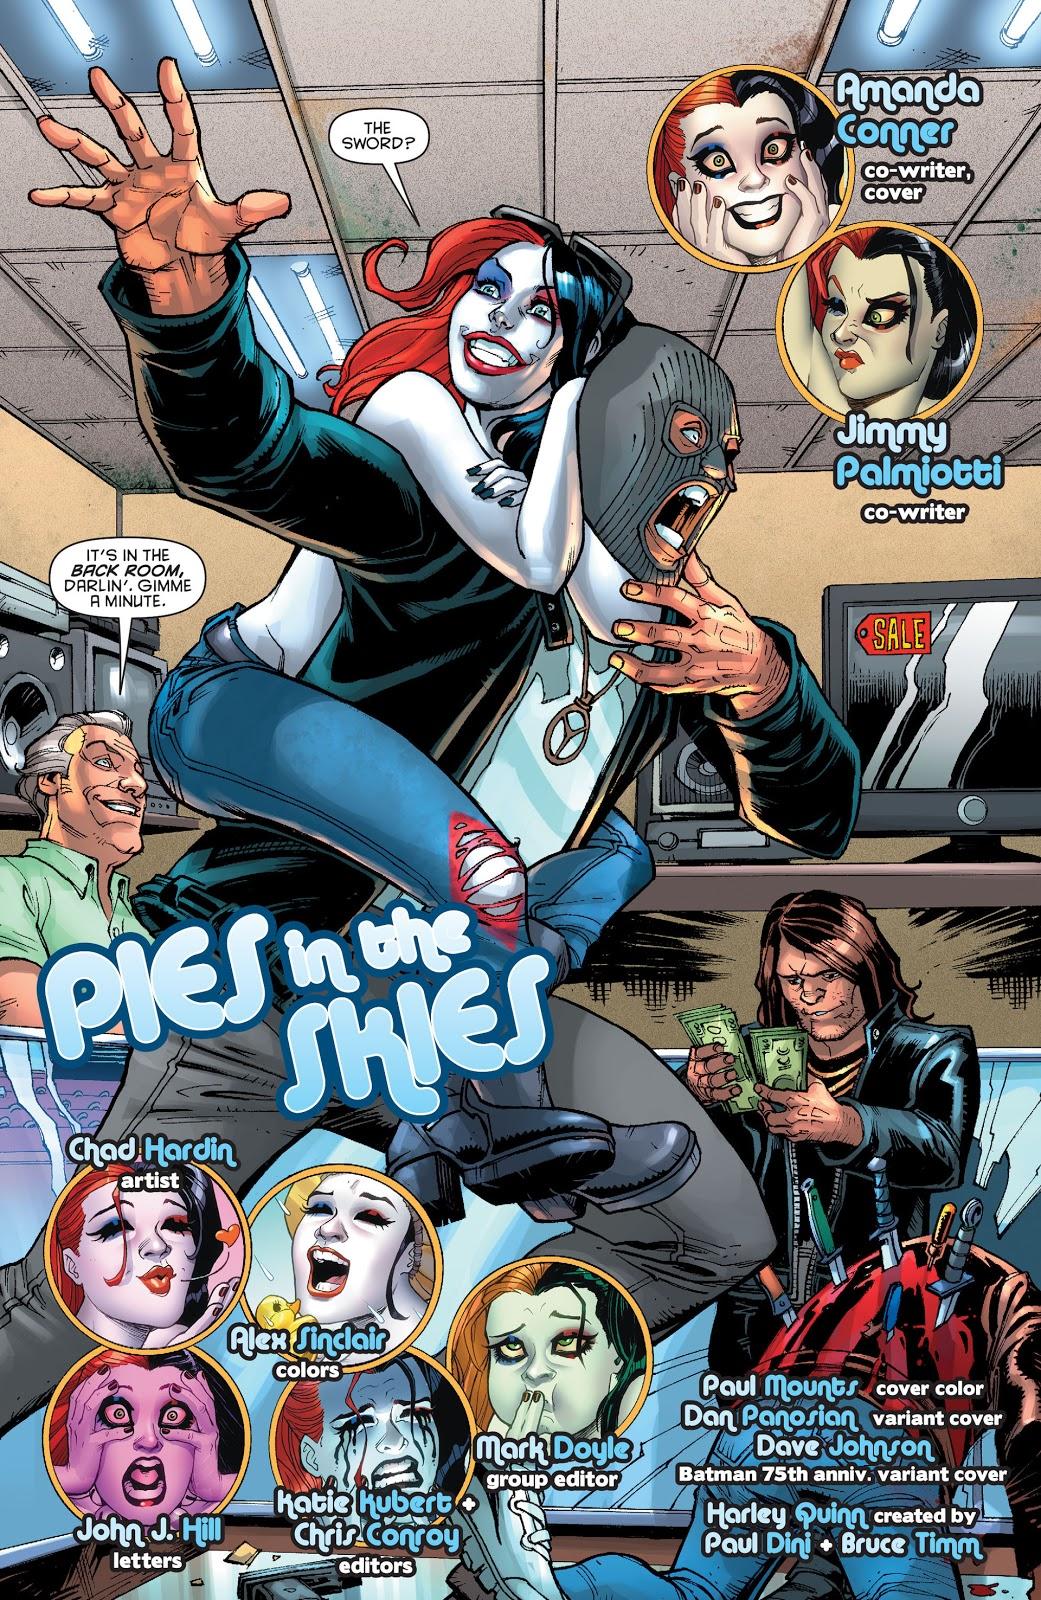 Harley Quinn Vol. 2 #8